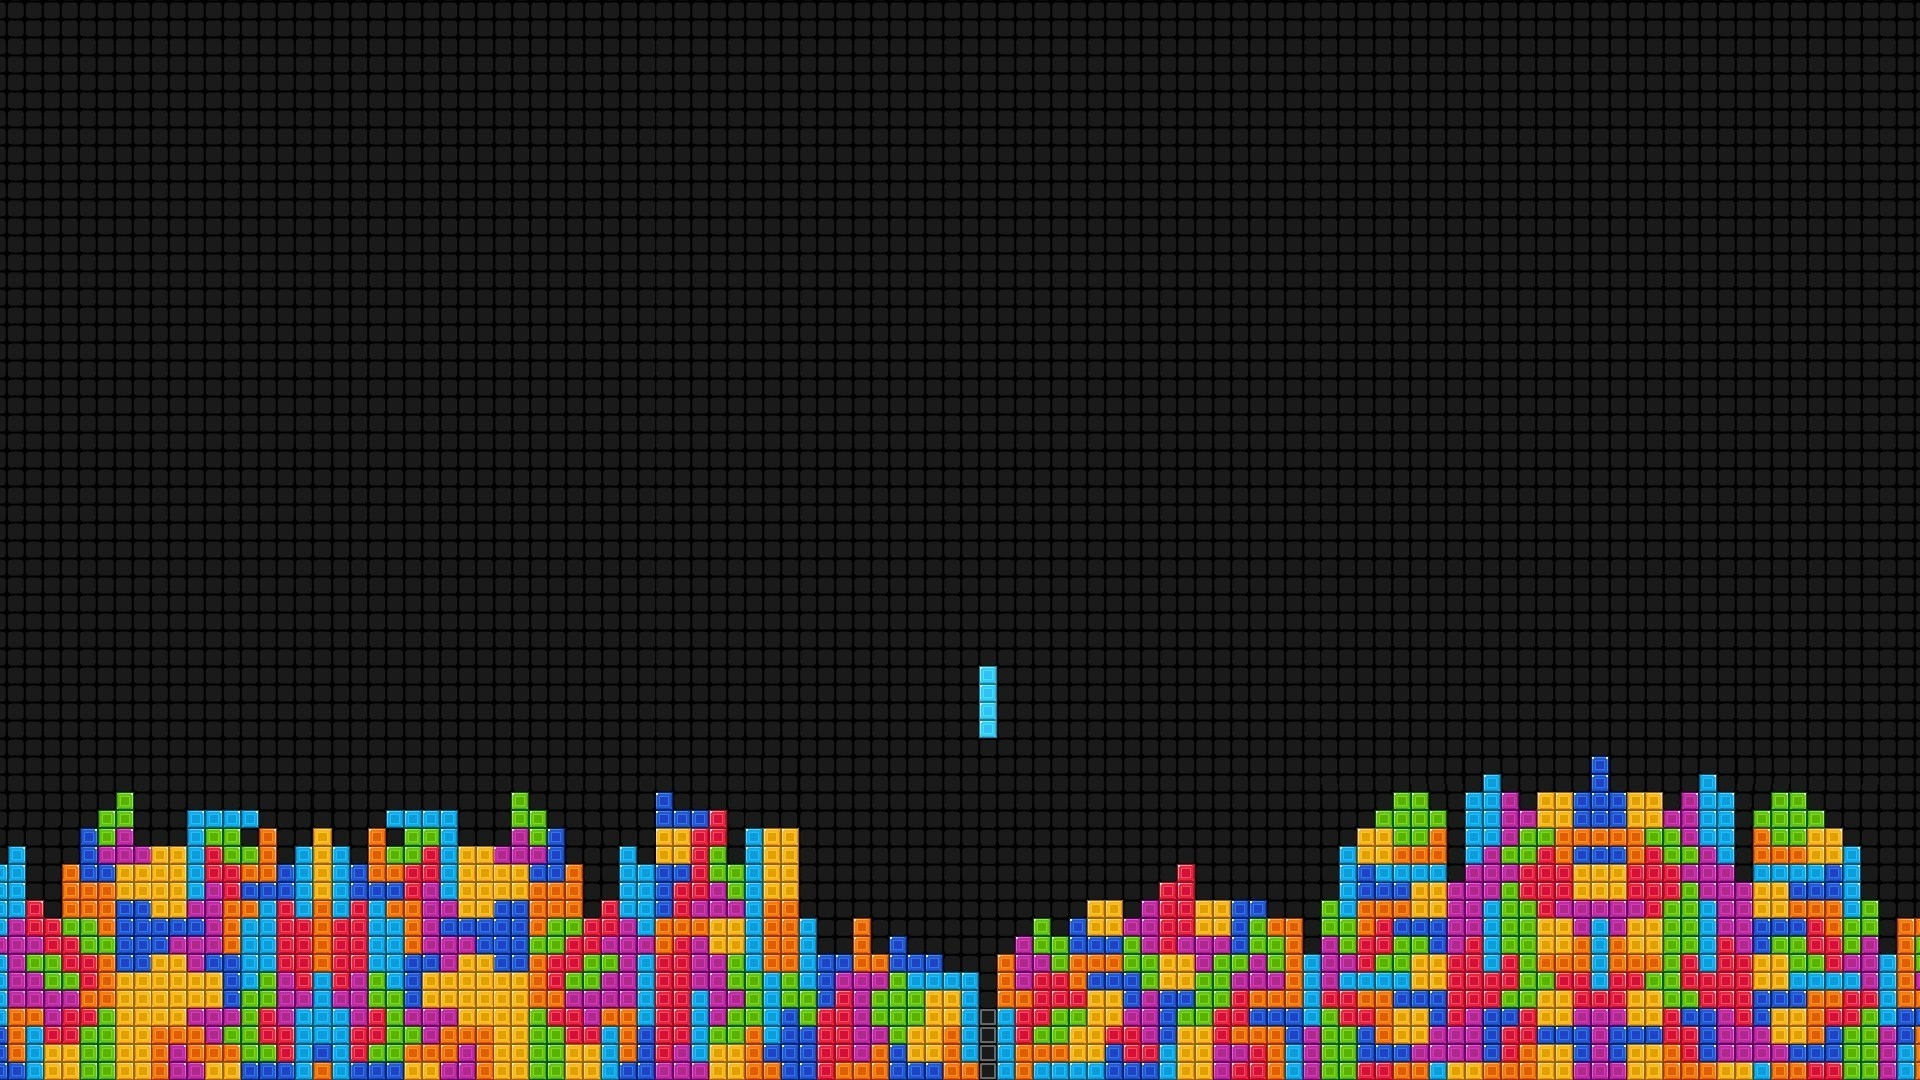 Background Texture Tetris Figures   Stock Photos Images HD 1920x1080